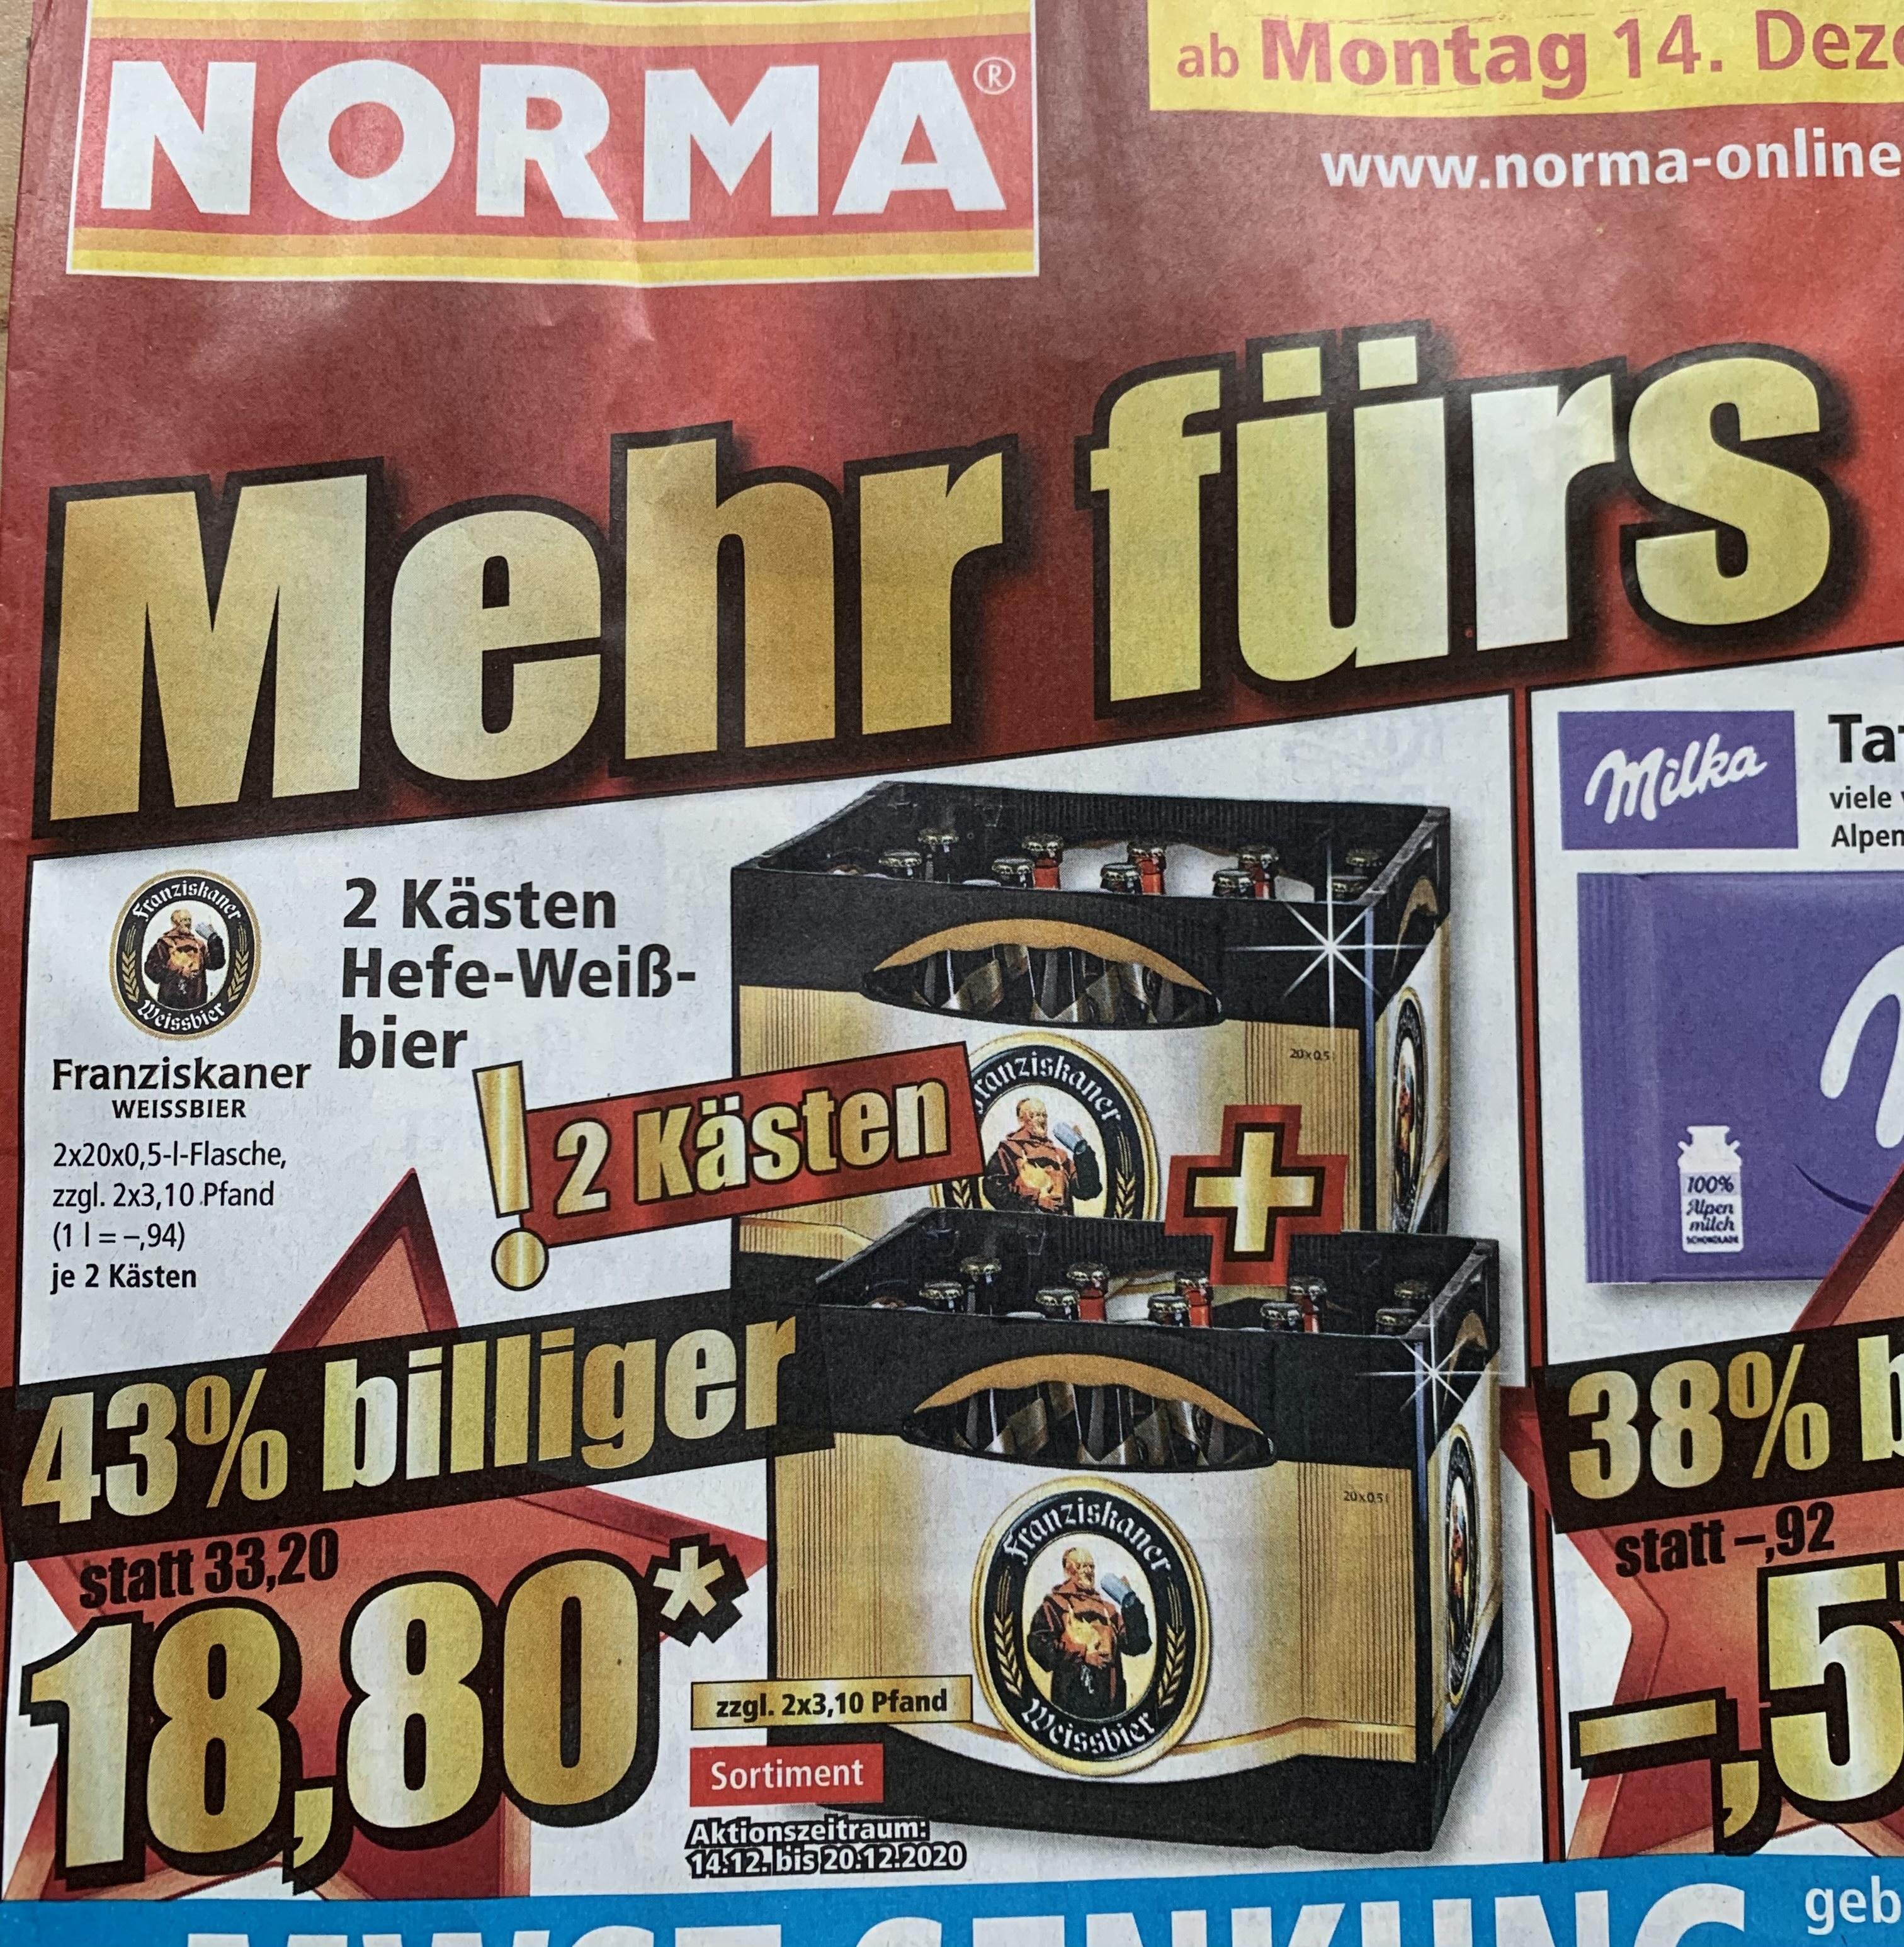 [Norma] Franziskaner Hefe-Weißbier 2 Kästen nur 18,80€